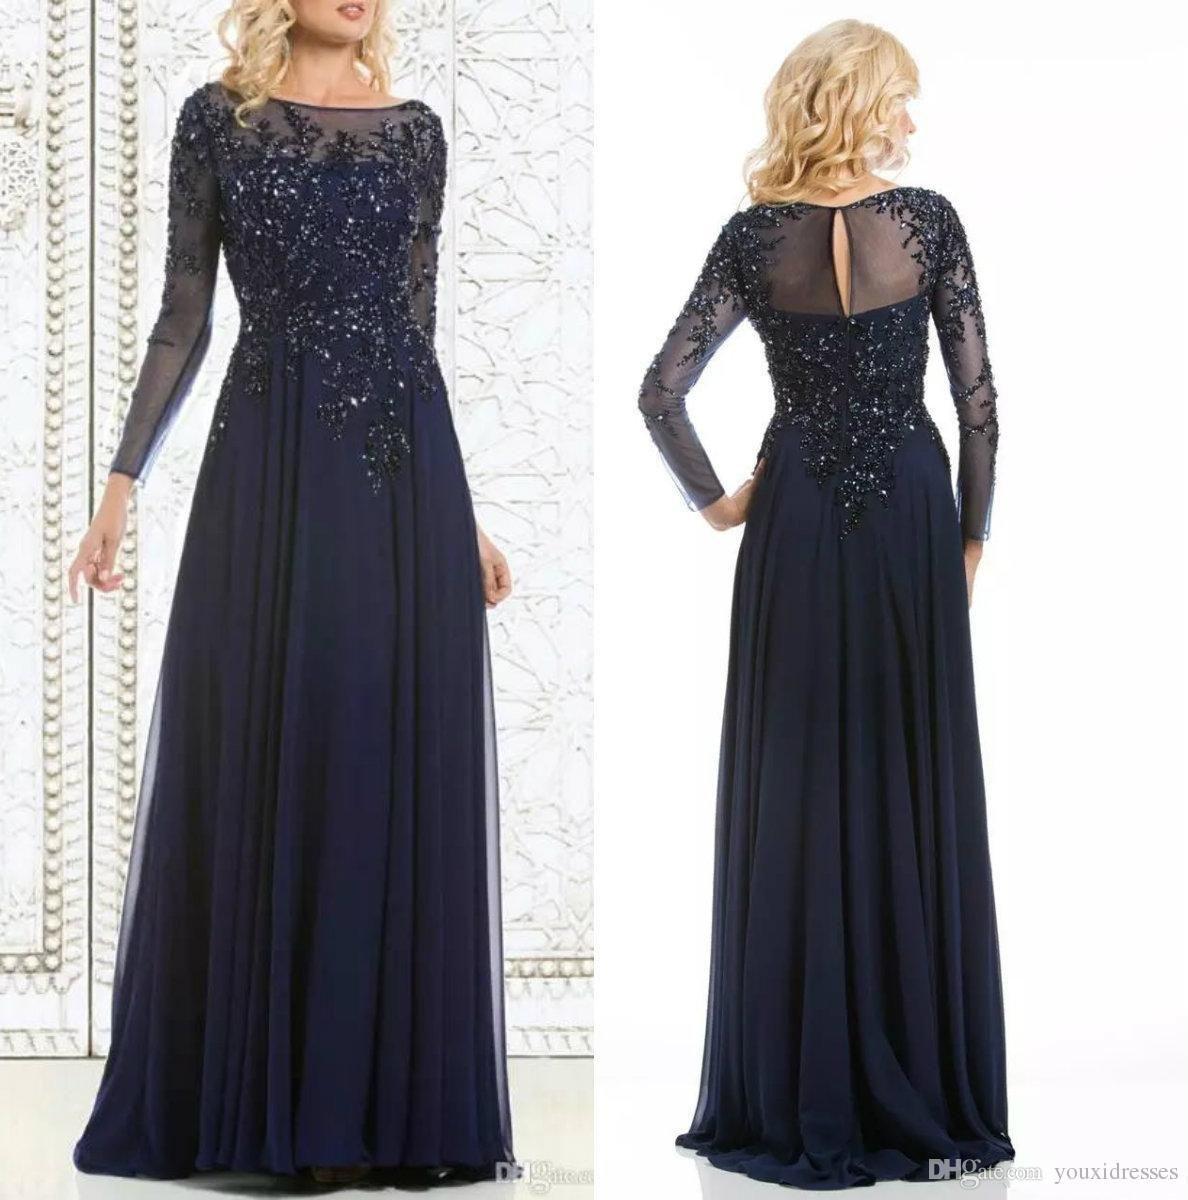 Elegant Navy Blue Mother Of The Bride Dresses Chiffon ...